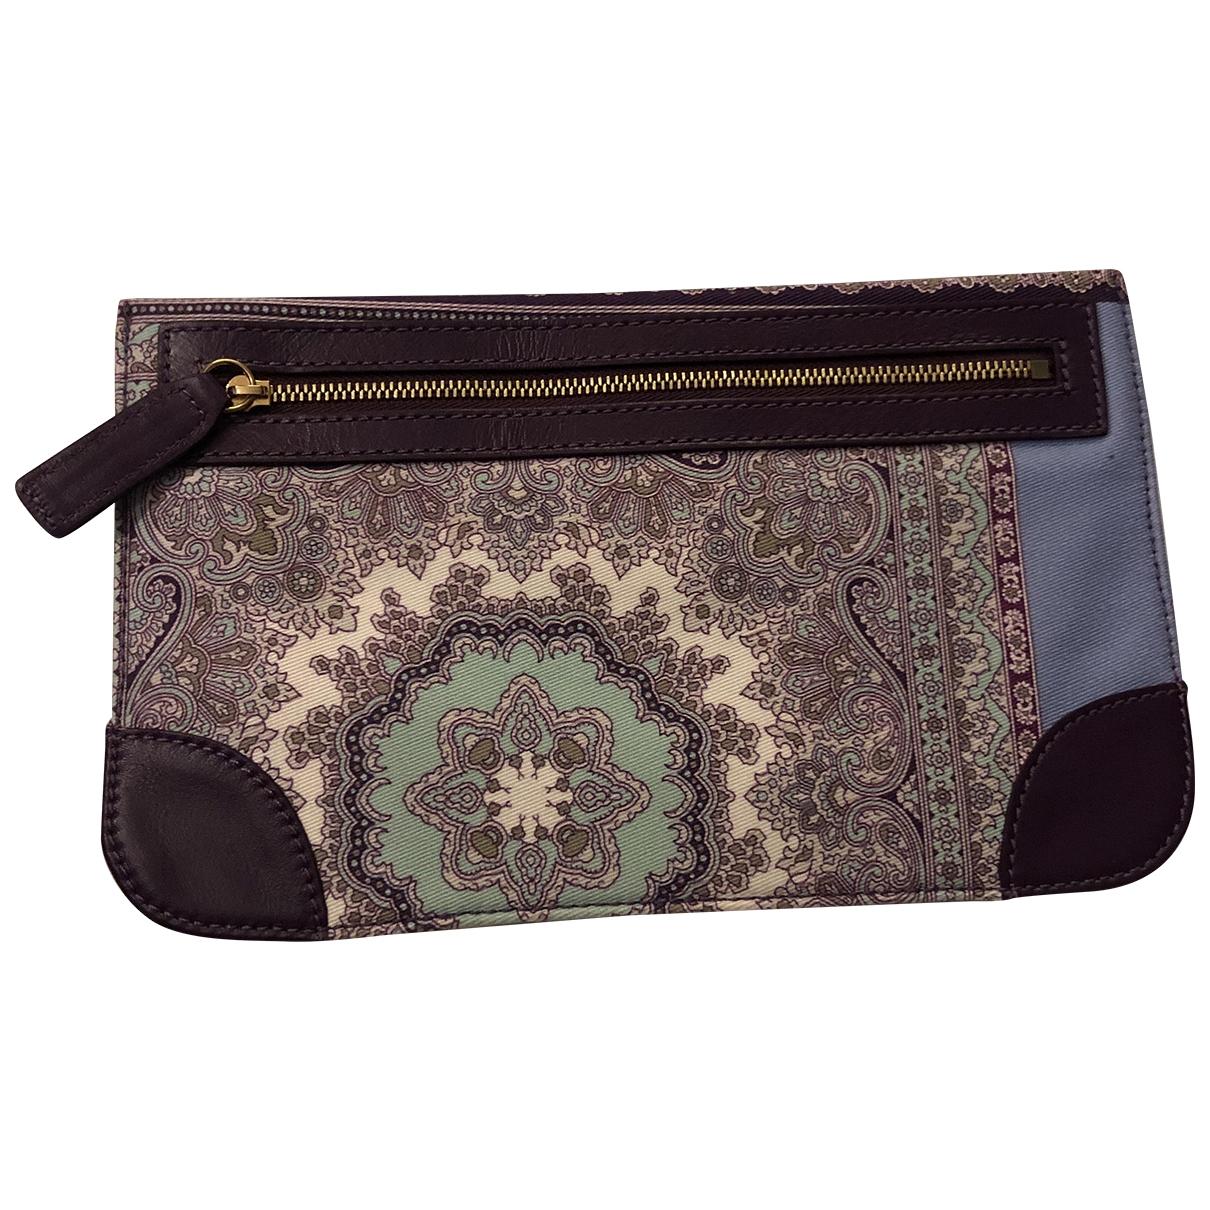 Etro \N Multicolour Cotton Clutch bag for Women \N